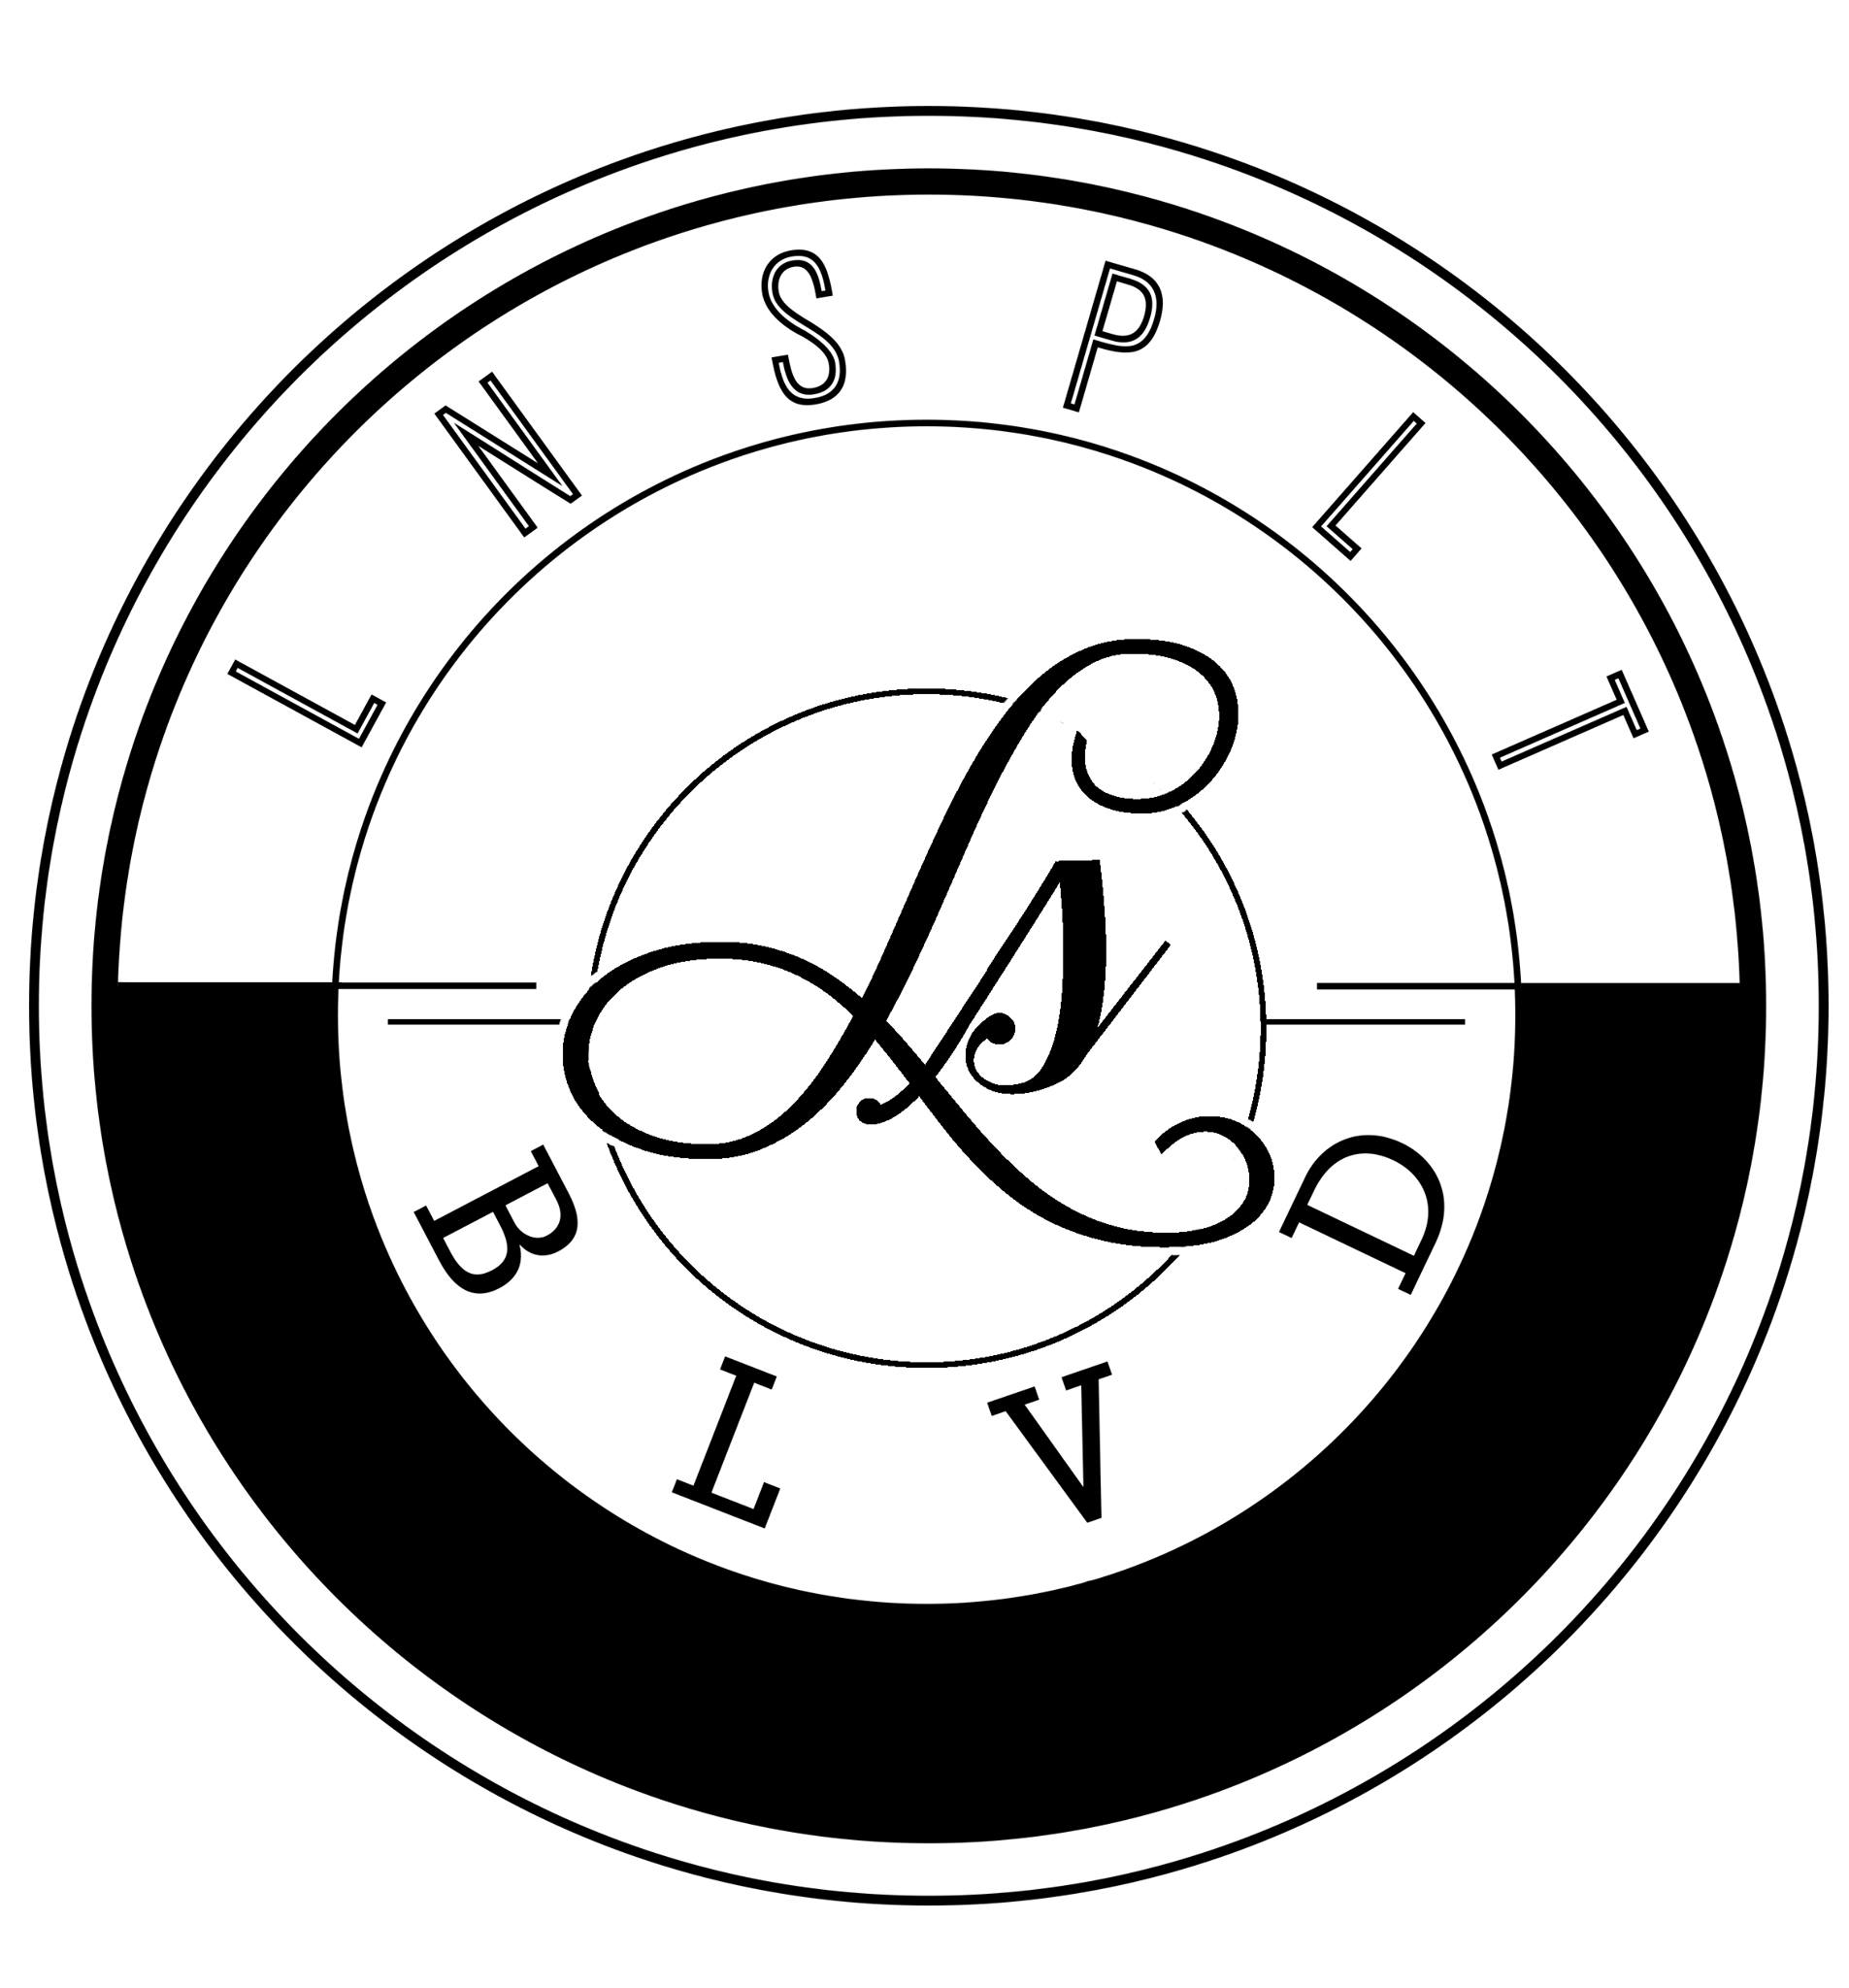 LNSPLT // BLVD